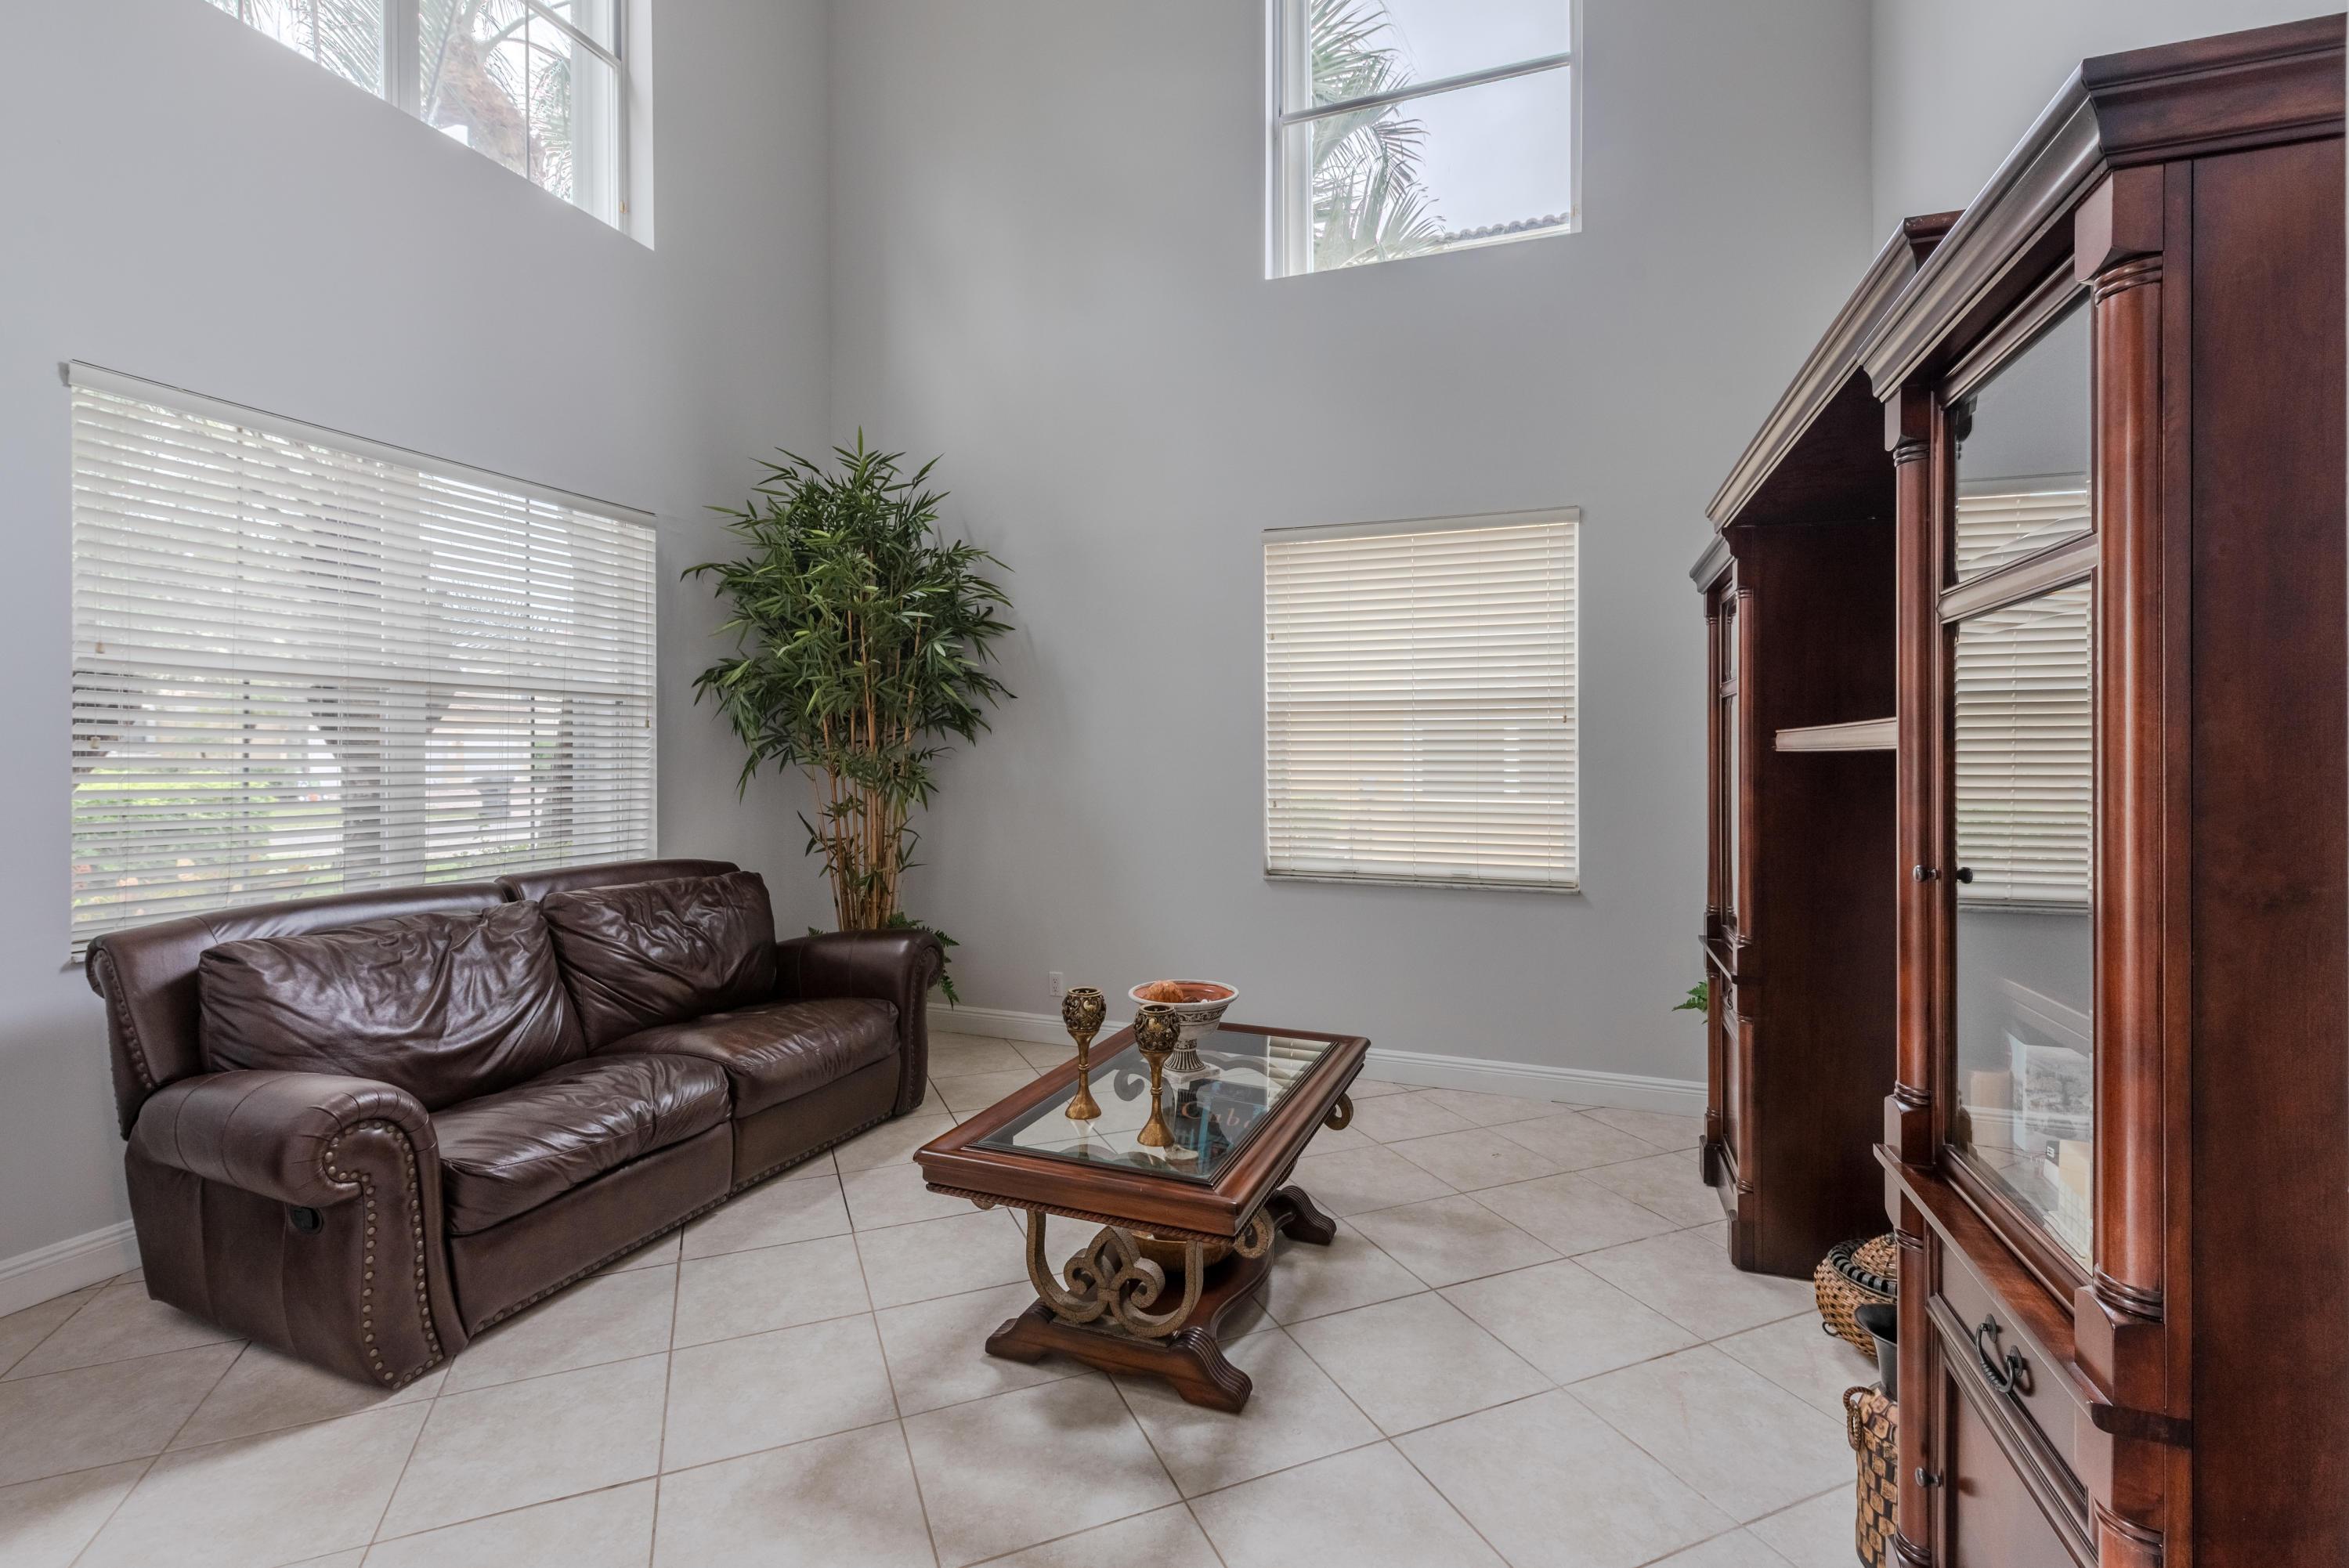 6821 Finamore Circle - 33467 - FL - Lake Worth